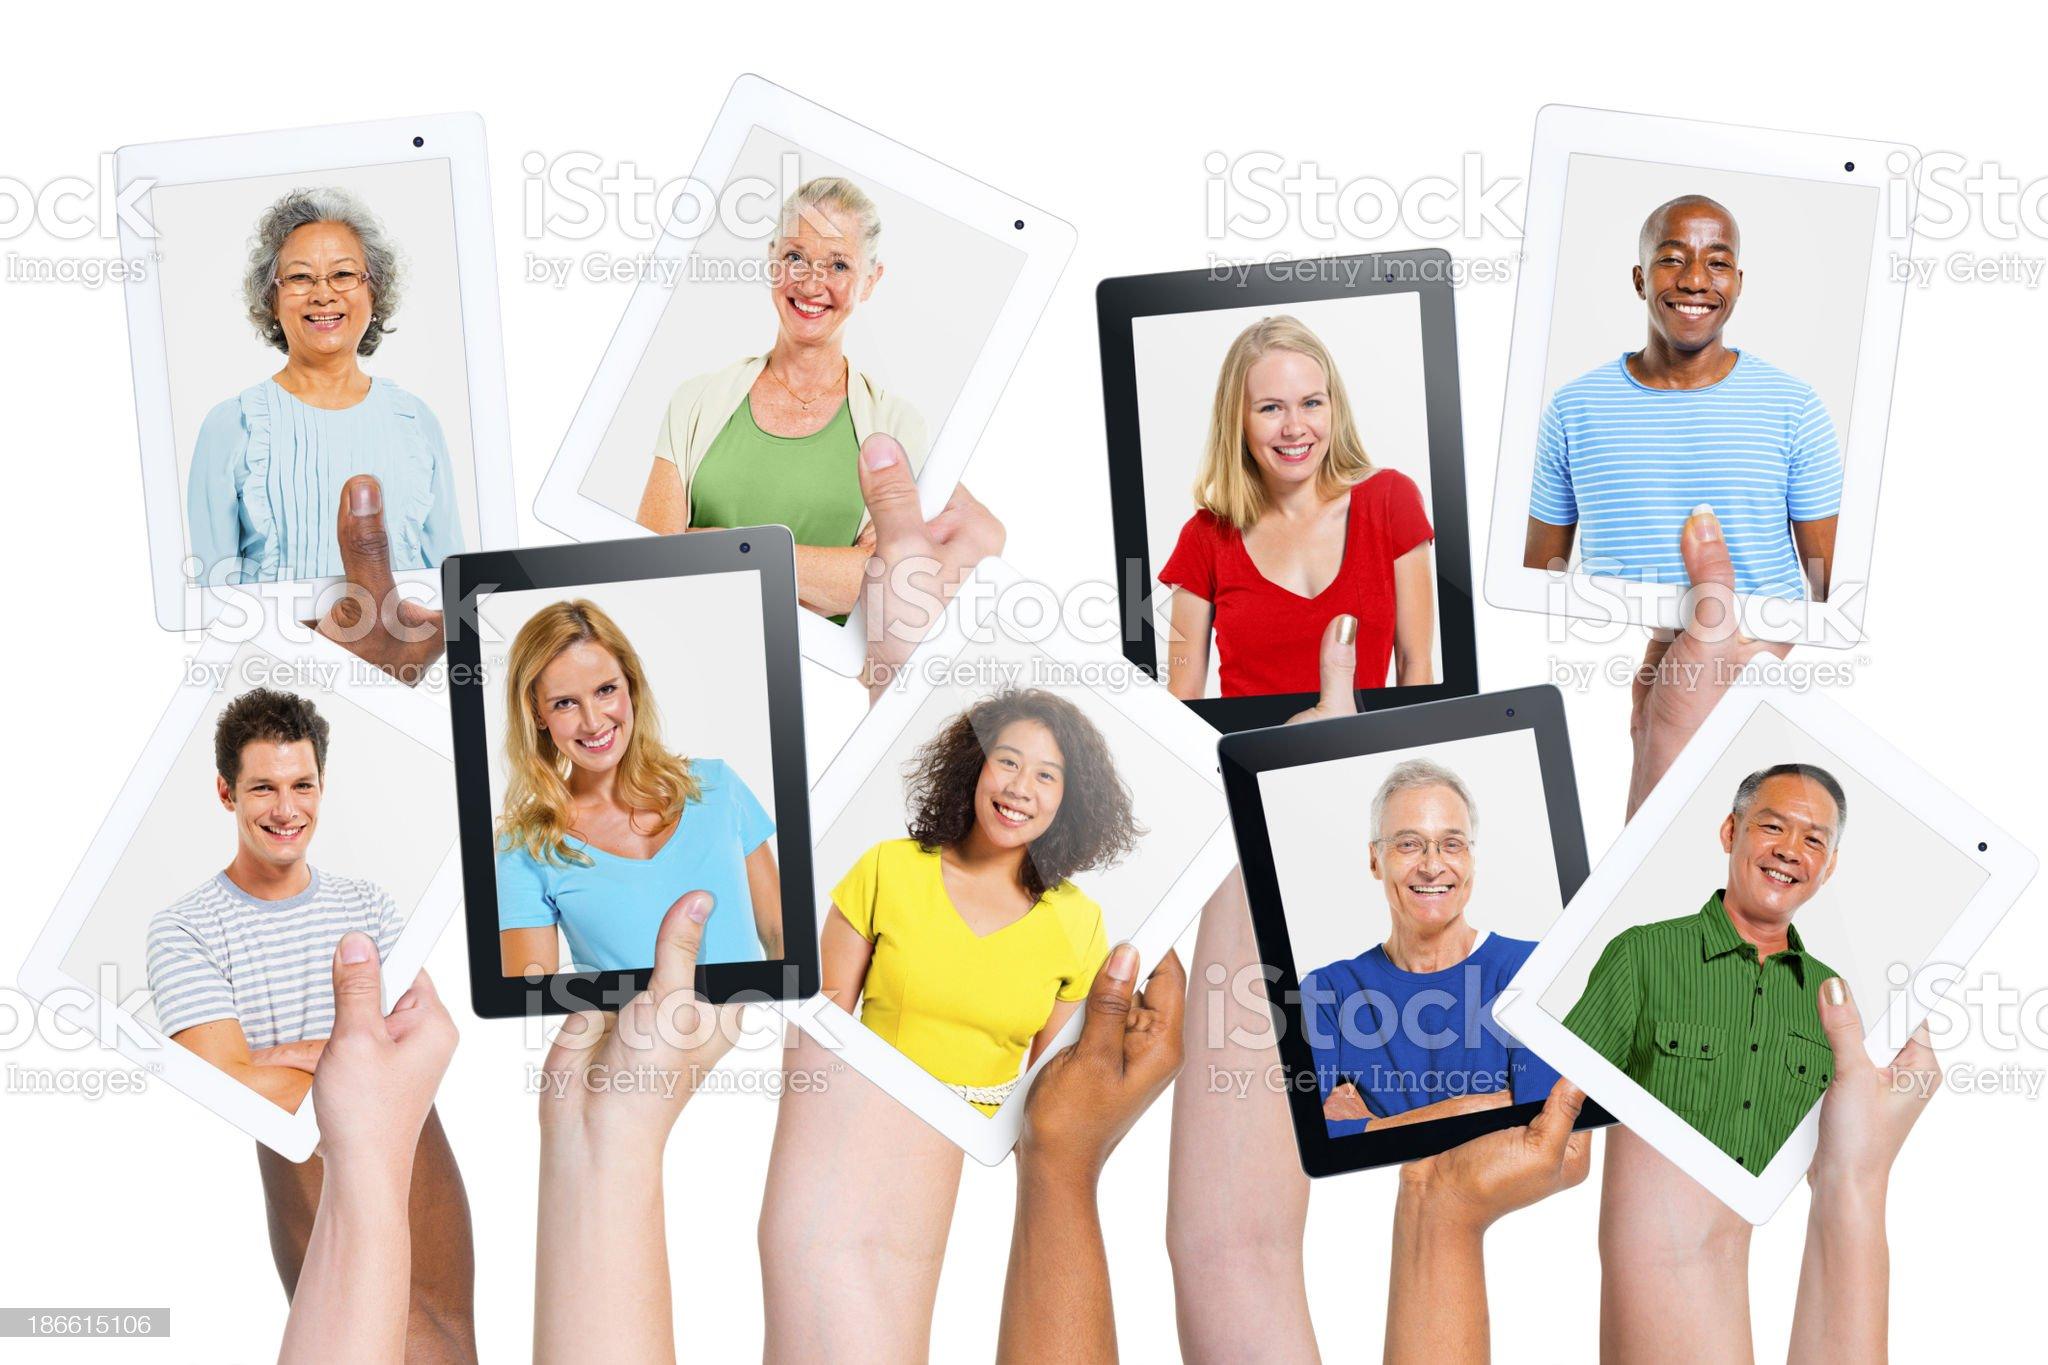 Network Communication royalty-free stock photo